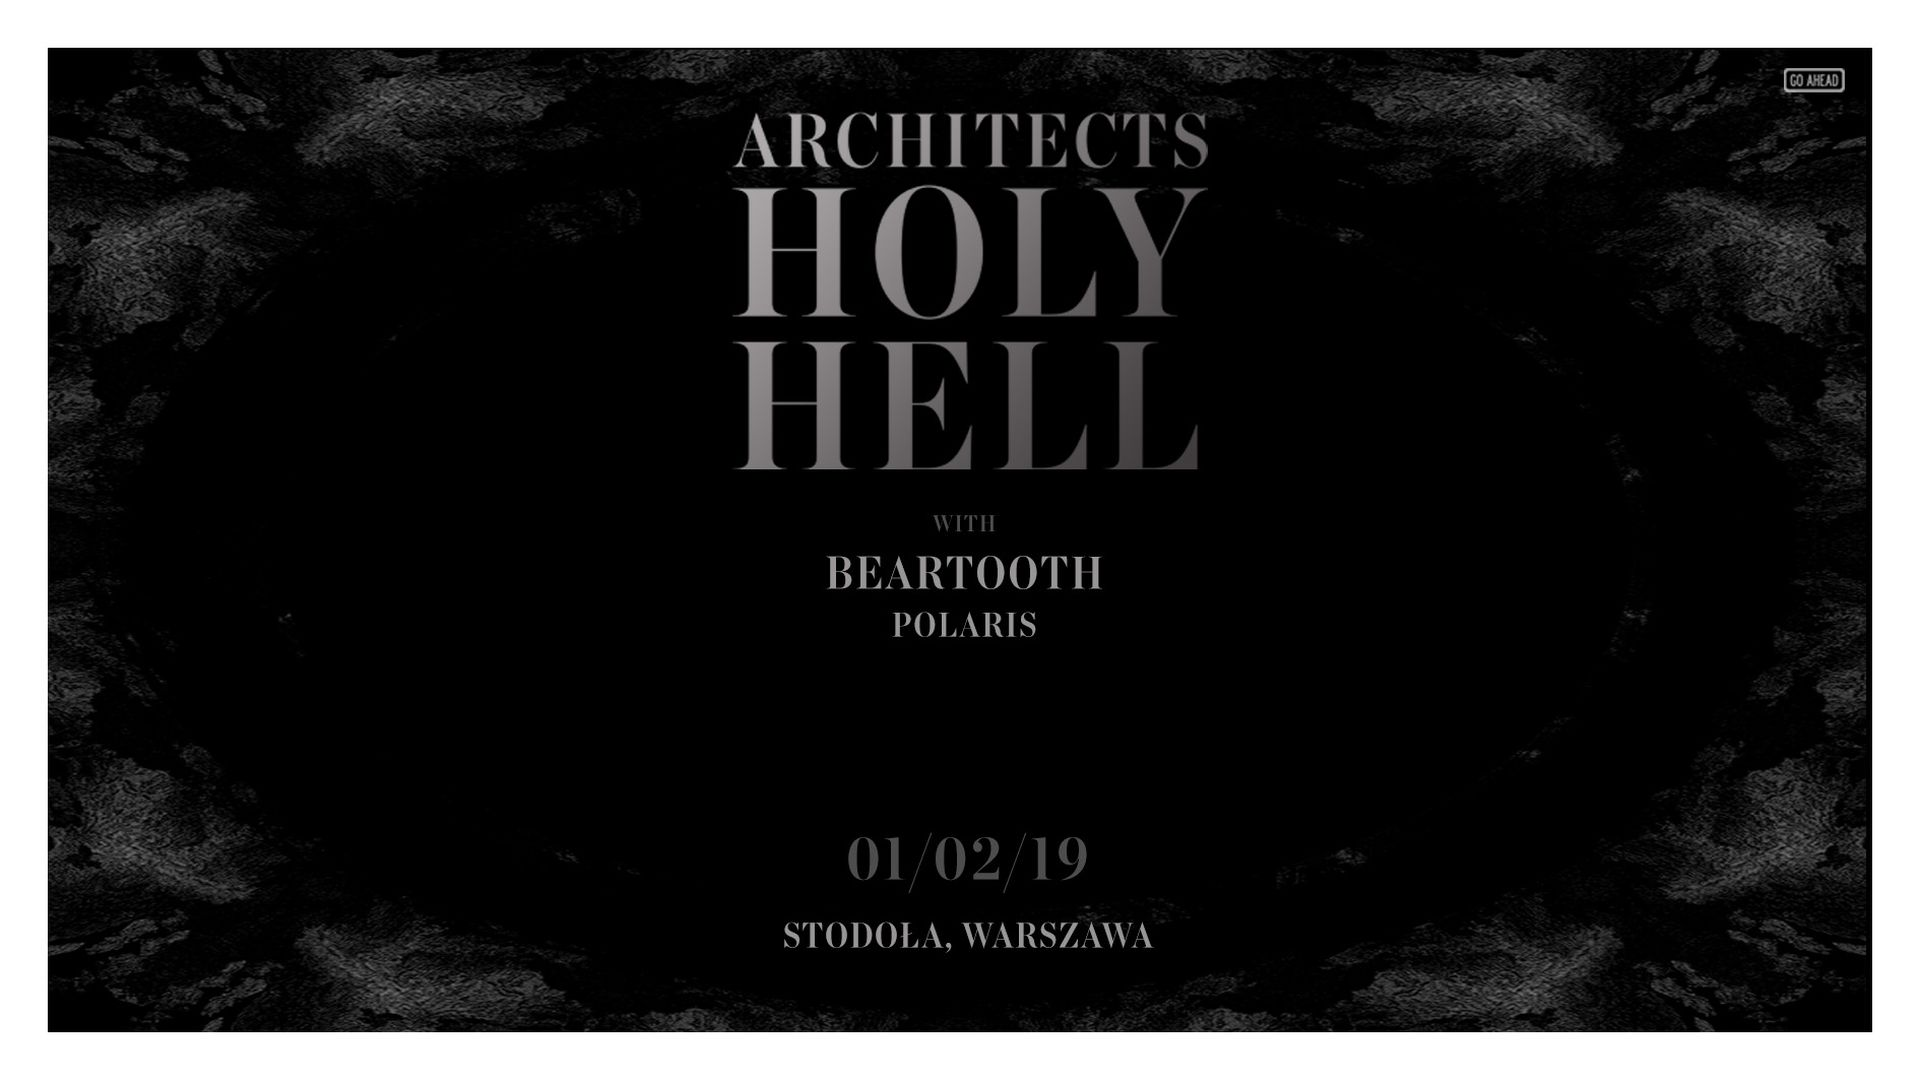 Bilety kolekcjonerskie - Architects